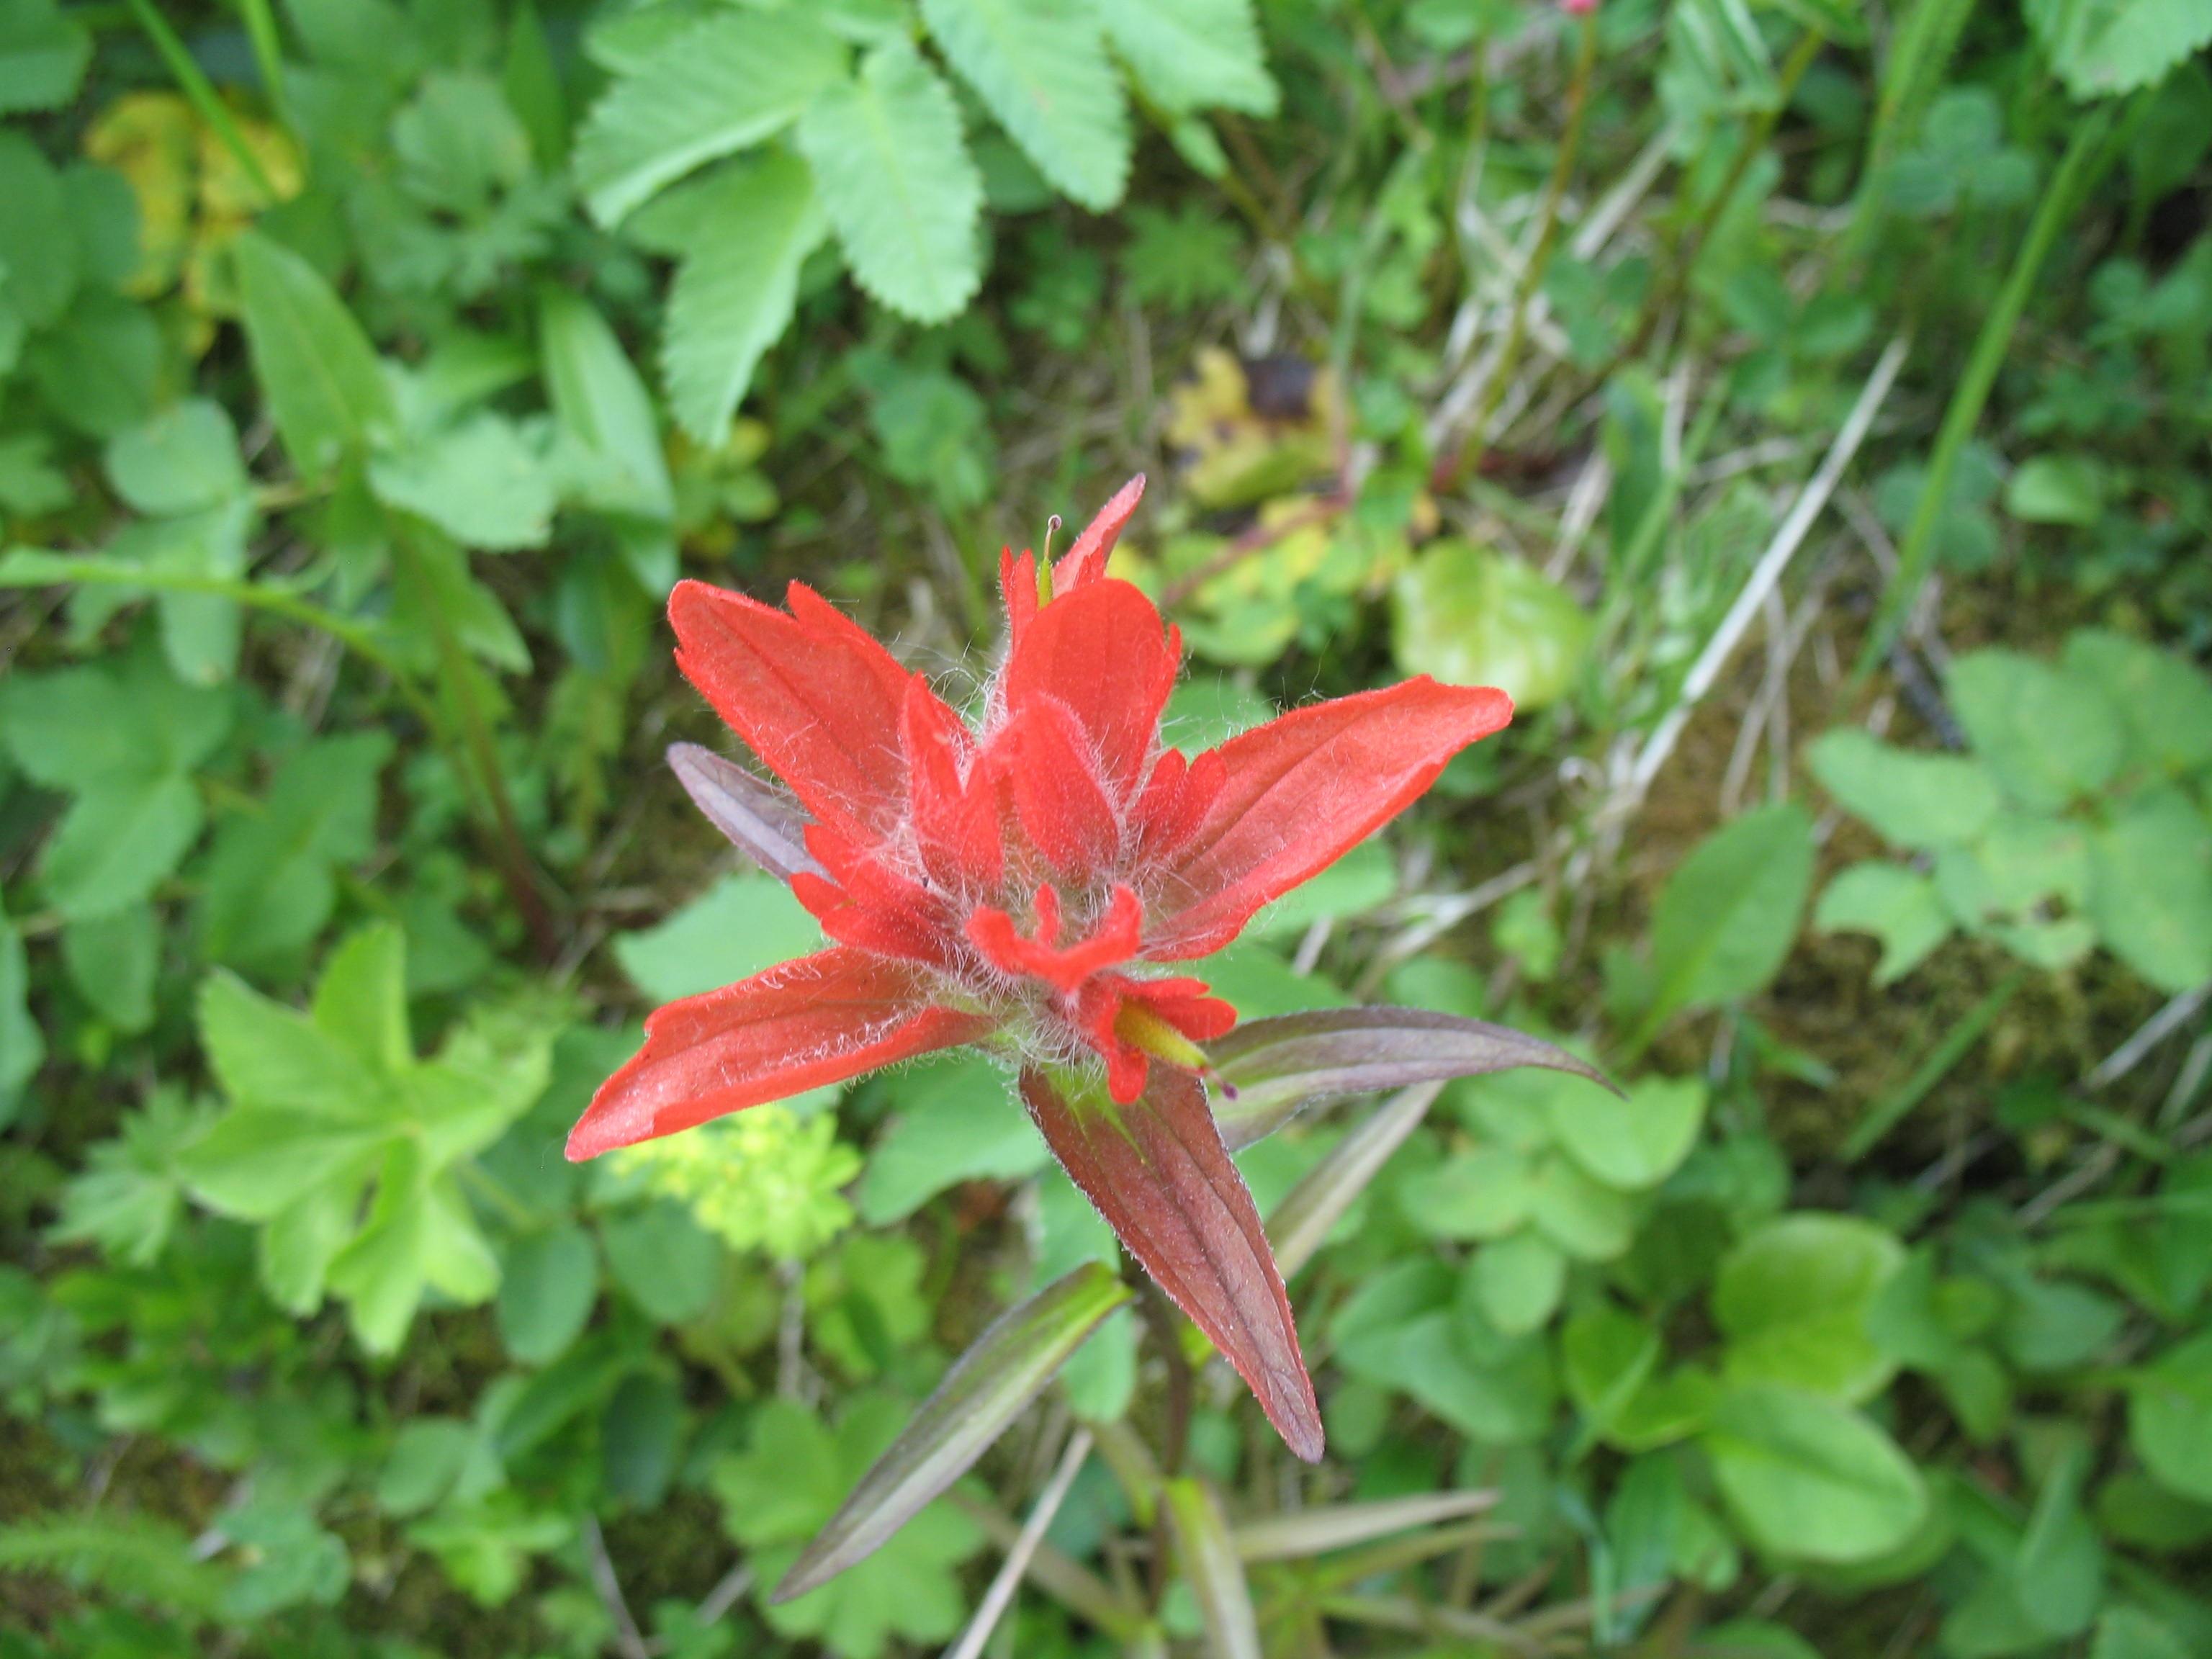 free images tree nature lawn leaf flower bloom spring